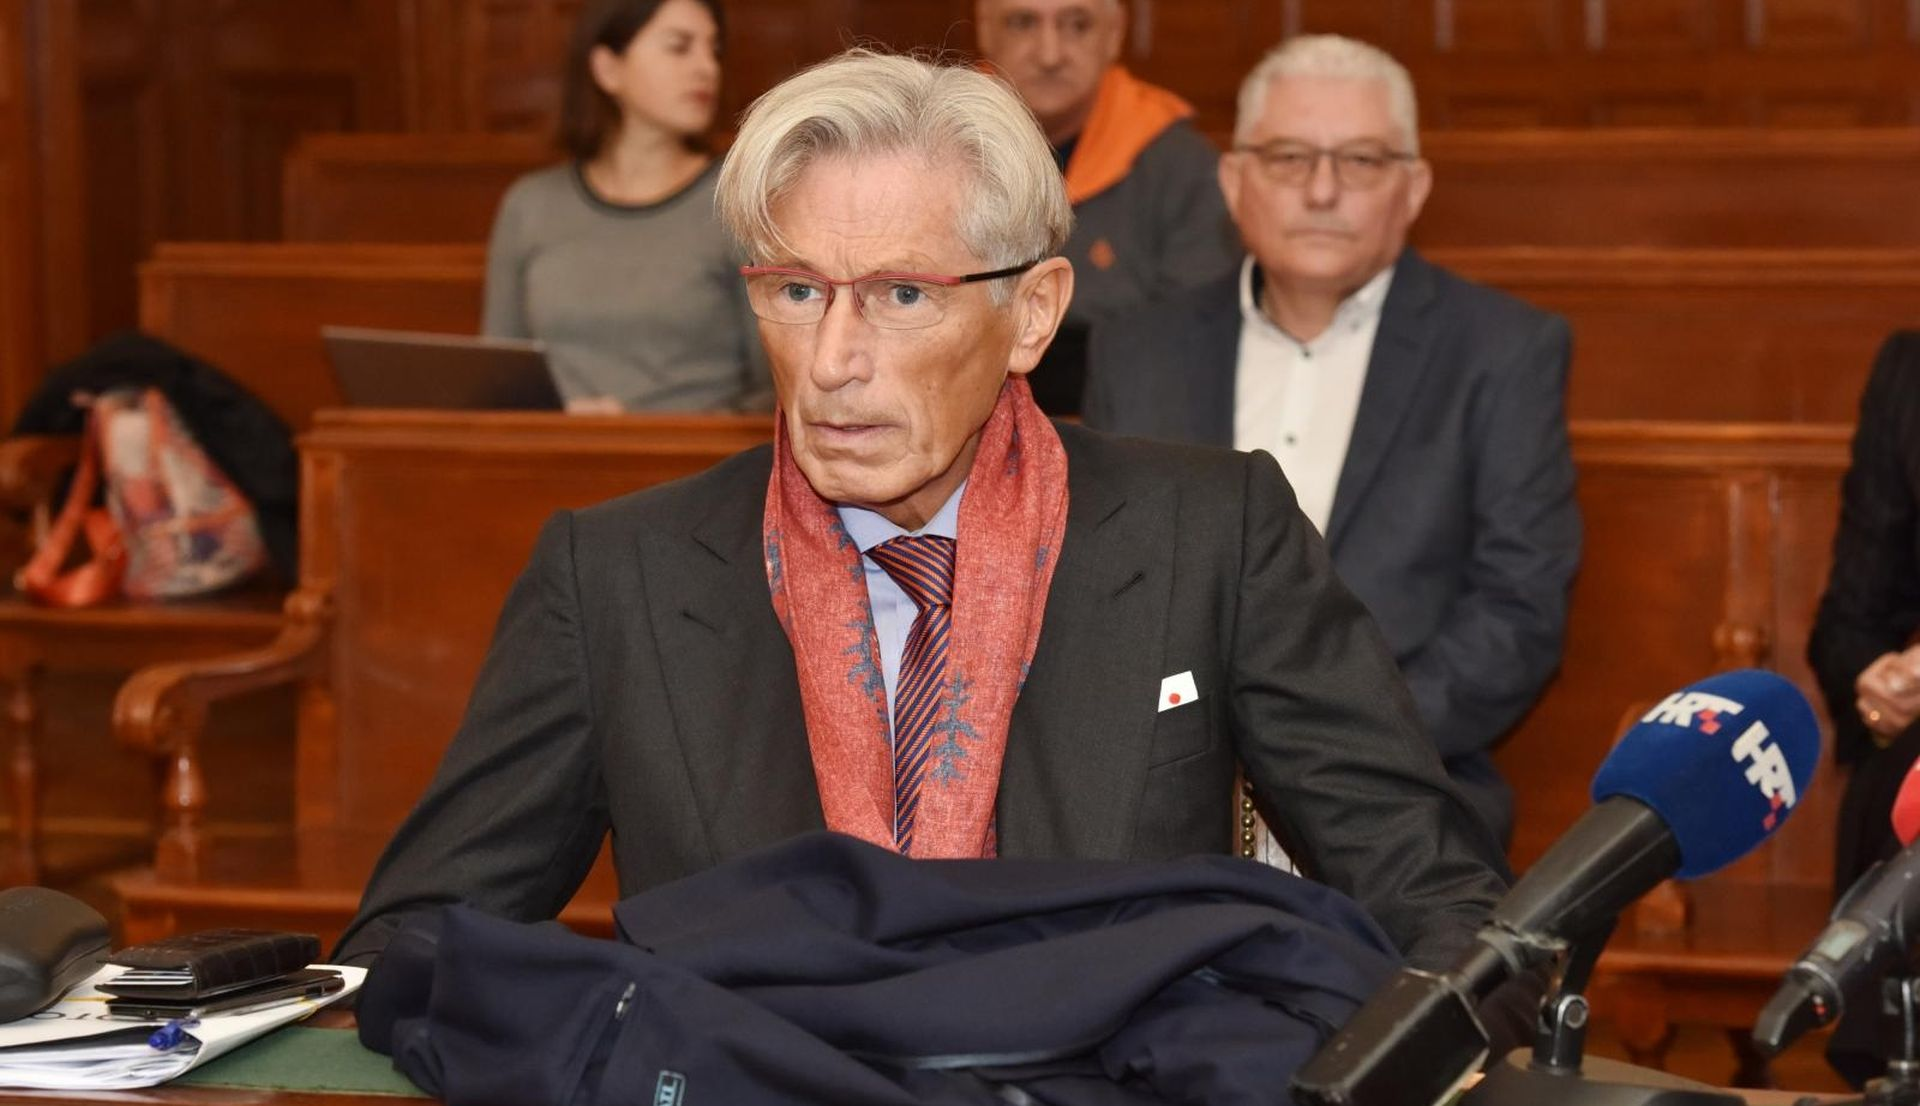 Na šibenskom sudu počelo ročište na trećem suđenju Horvatinčiću